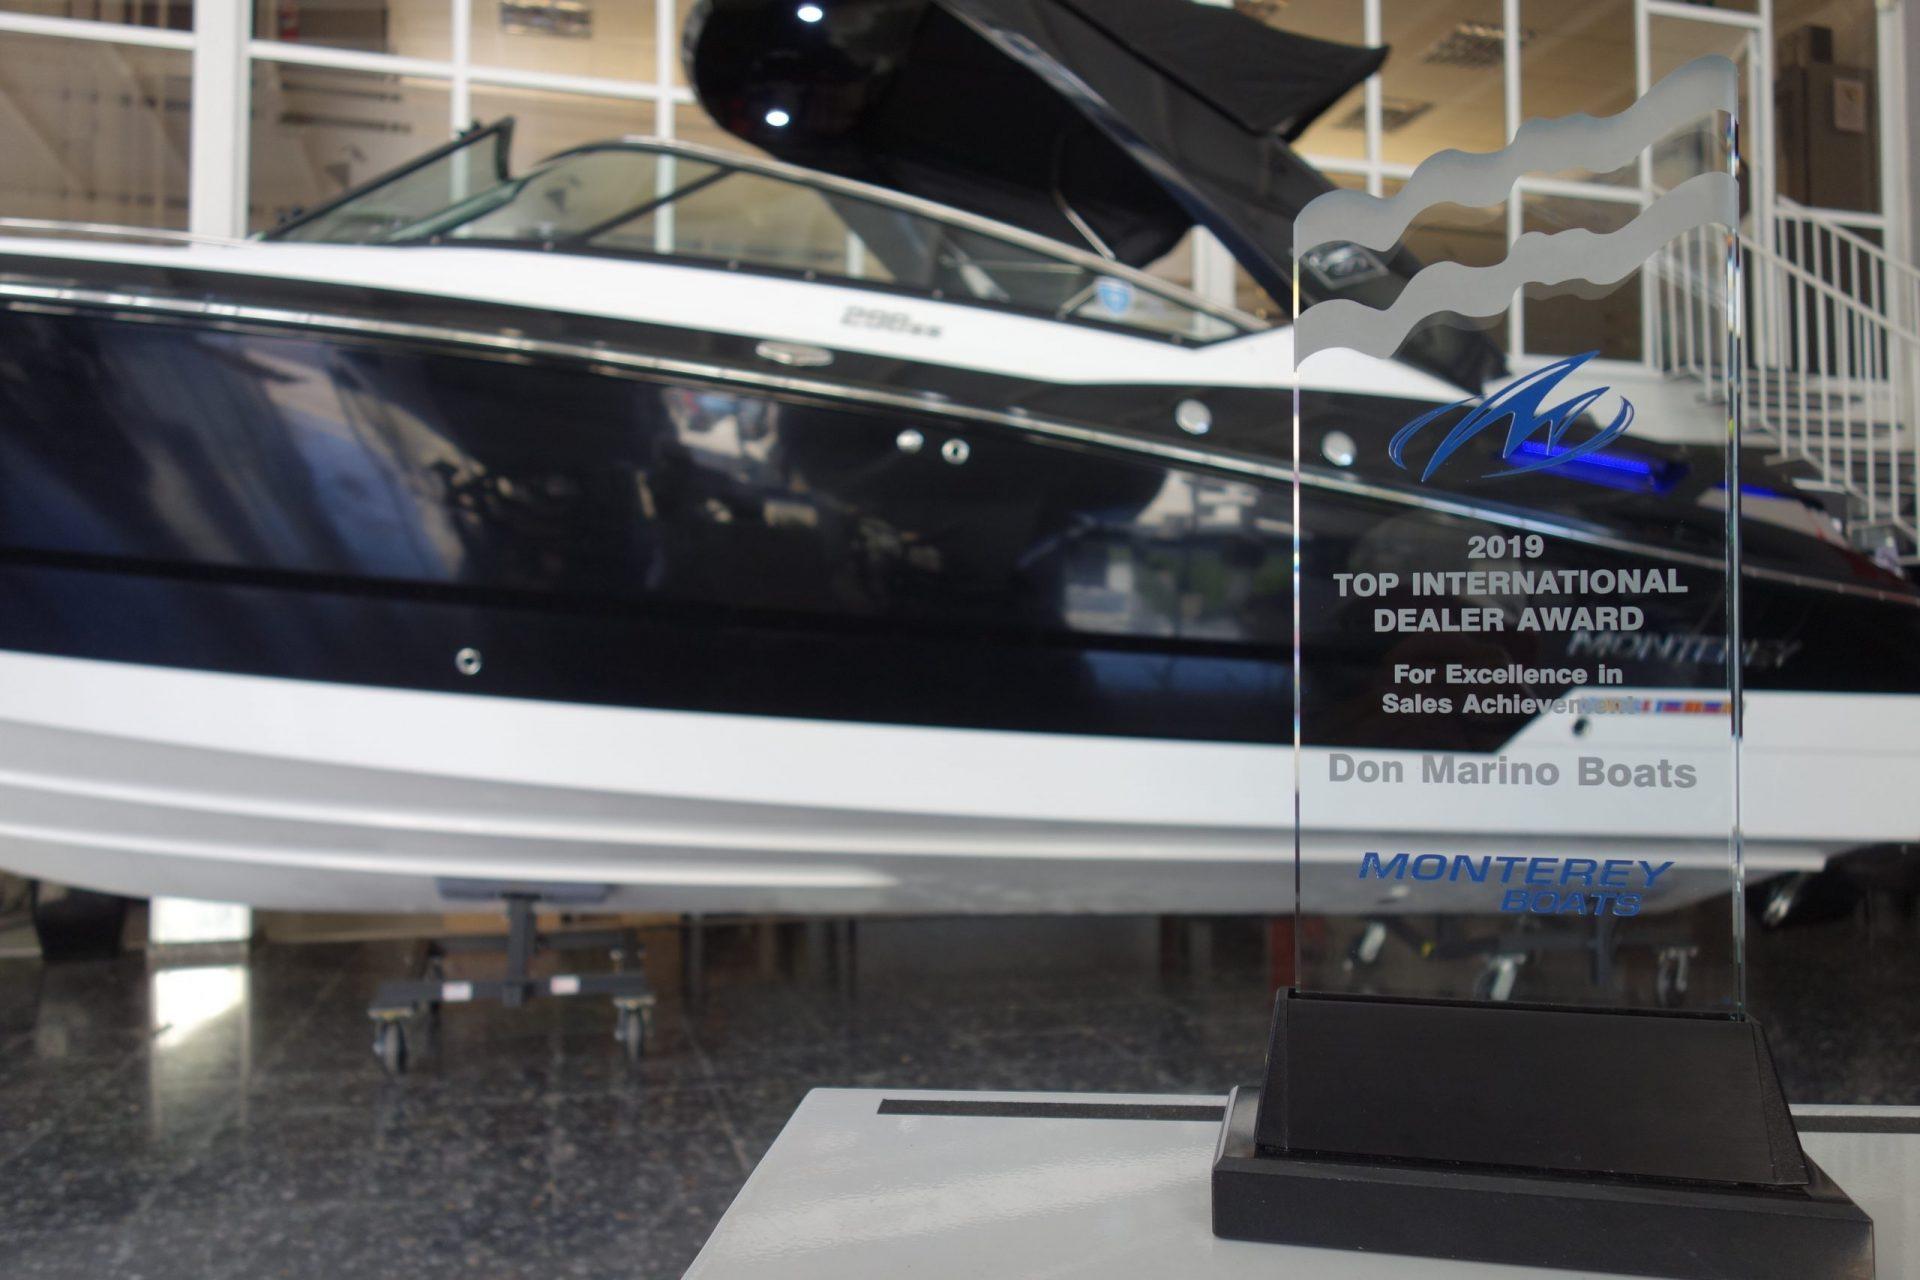 Don Marino Boats #1 international dealer on sales achievements during the 2019 season...